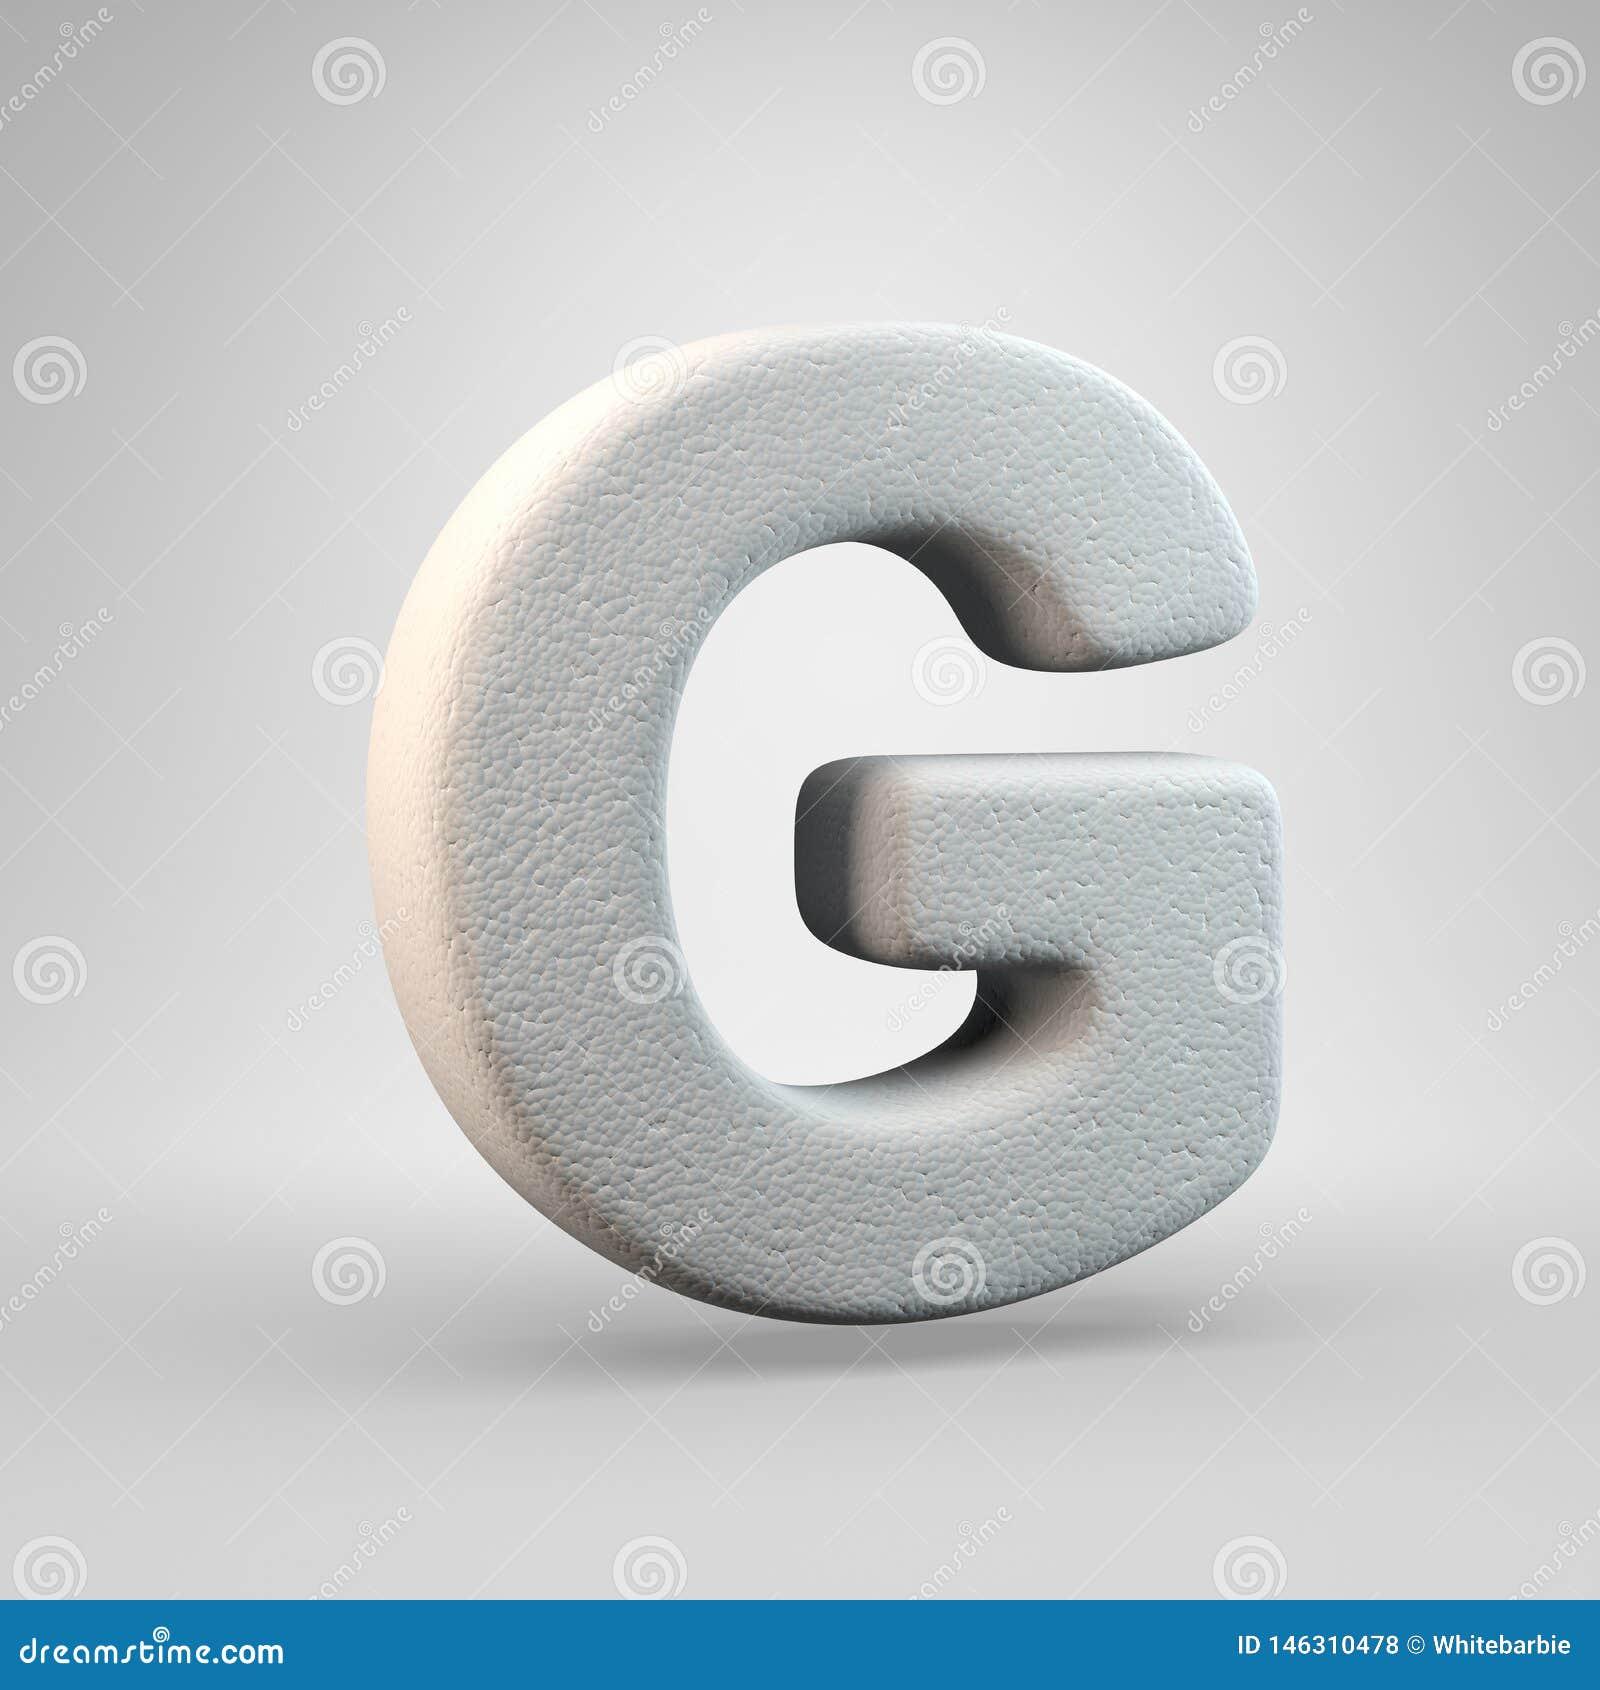 Volumetric construction foam uppercase letter G isolated on white background